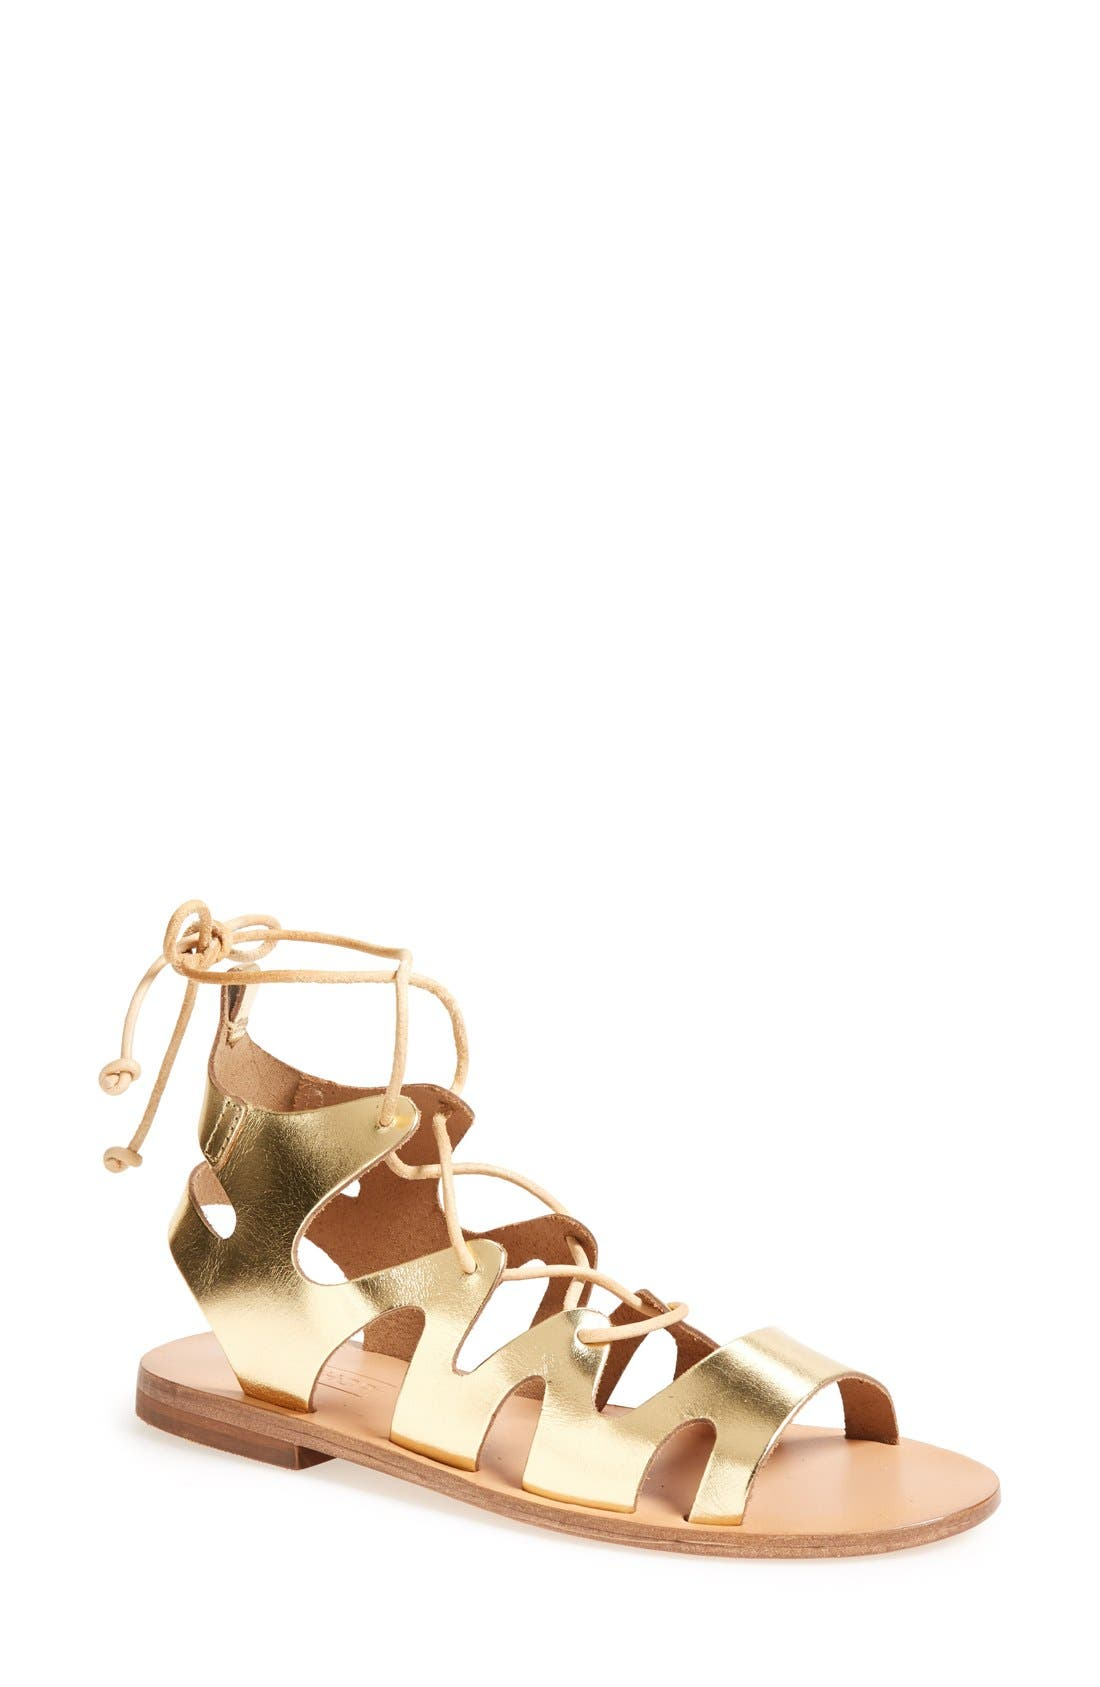 Main Image - Topshop 'Fig' Cutout Lace-Up Gladiator Sandal (Women)